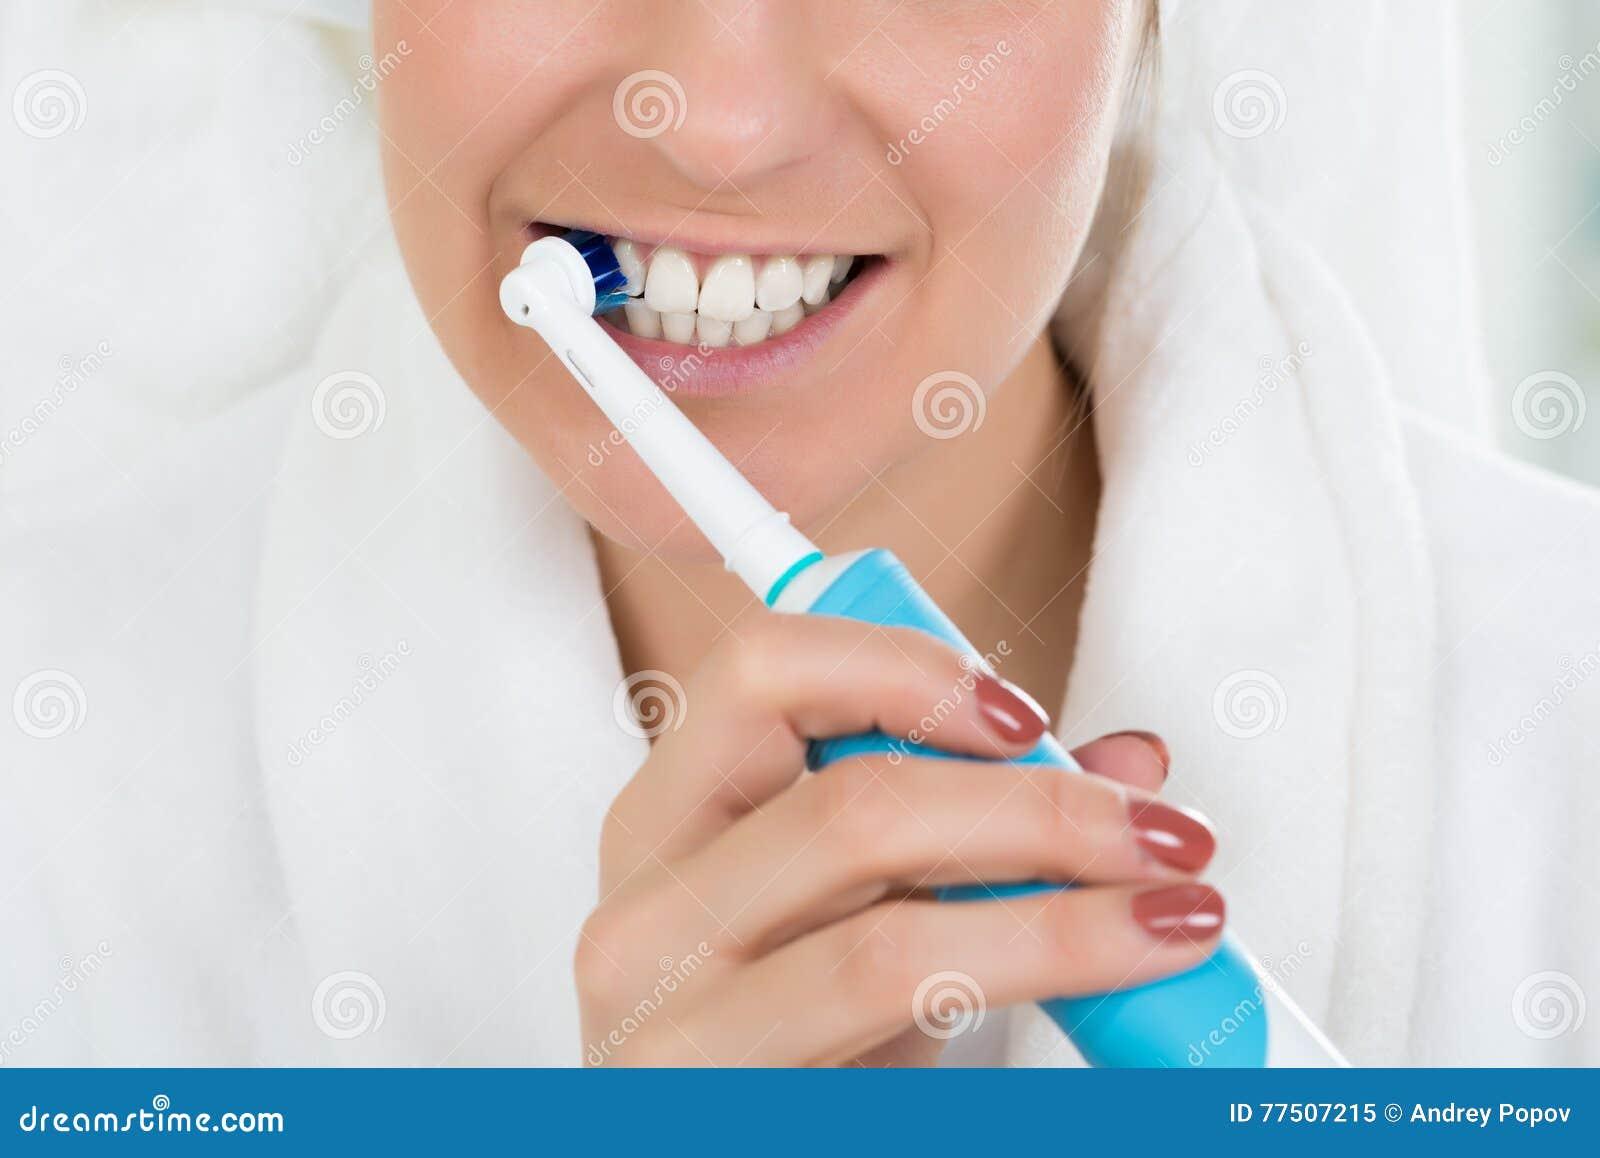 Woman In Bathrobe Brushing Teeth With Electric Toothbrush